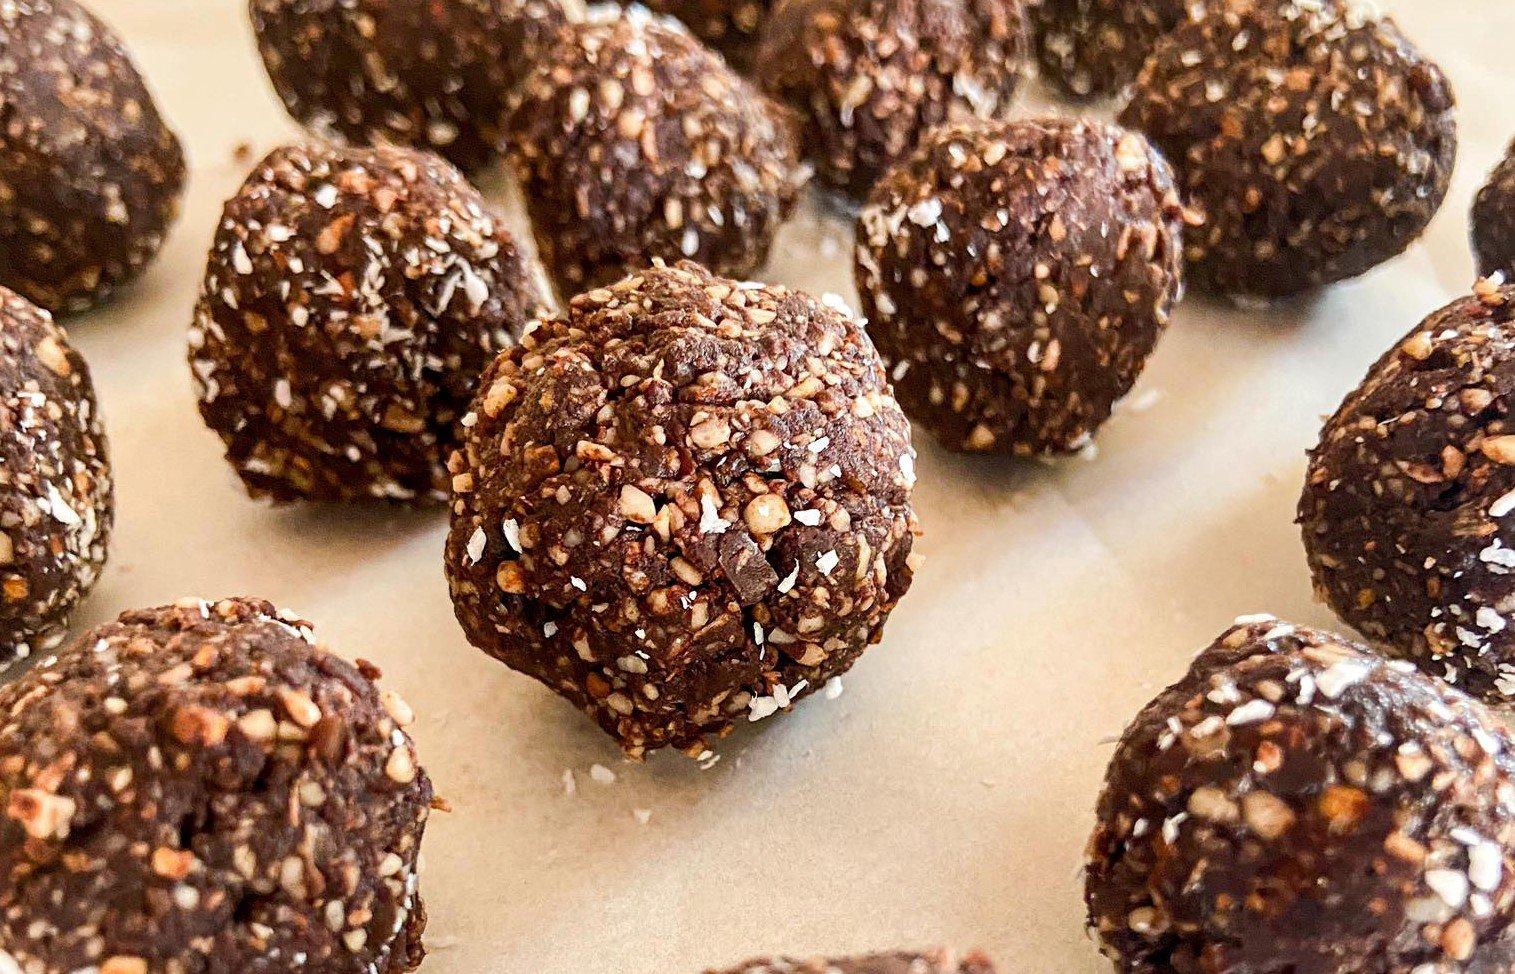 Snack time: Φτιάξτε τα πιο υγιεινά και νόστιμα energy balls